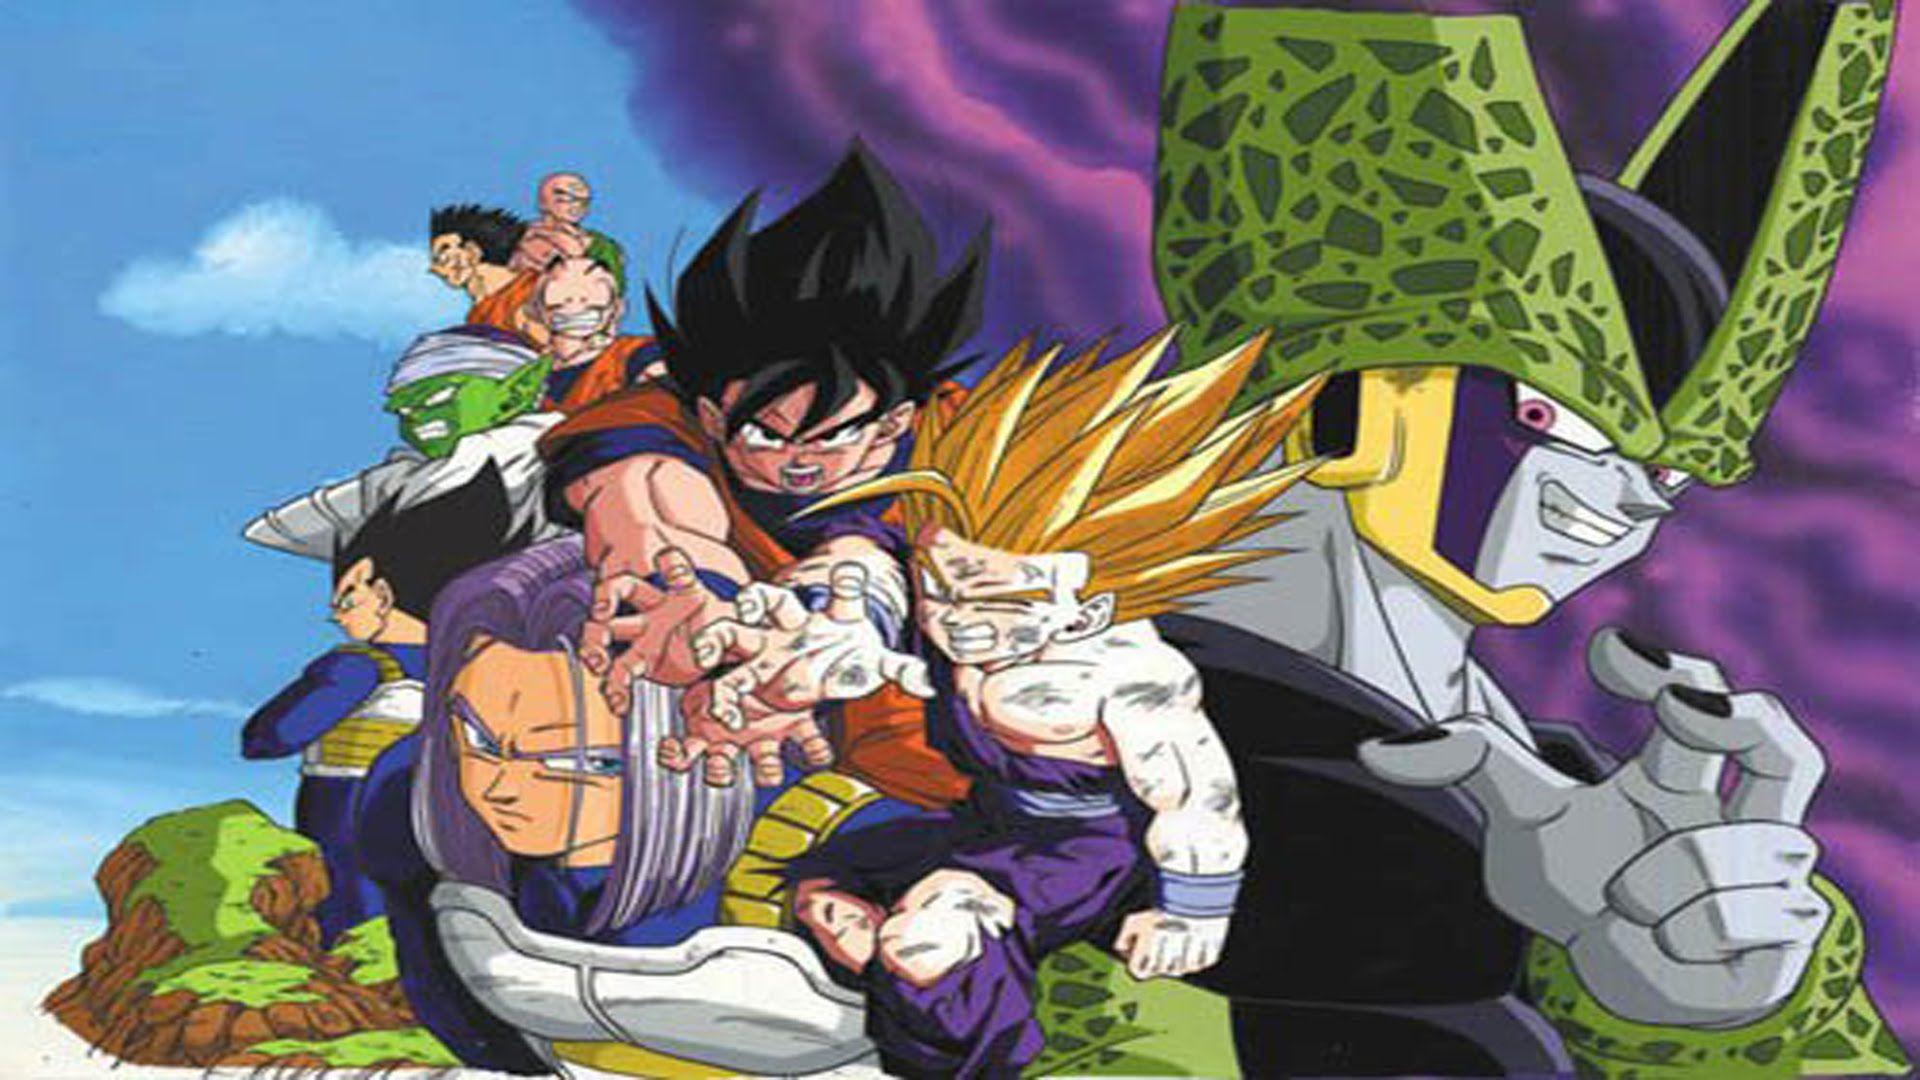 Gohan Vs Cell Pelea Completa Audio Latino Hd 720p Dragones Guerreros Dragon Ball